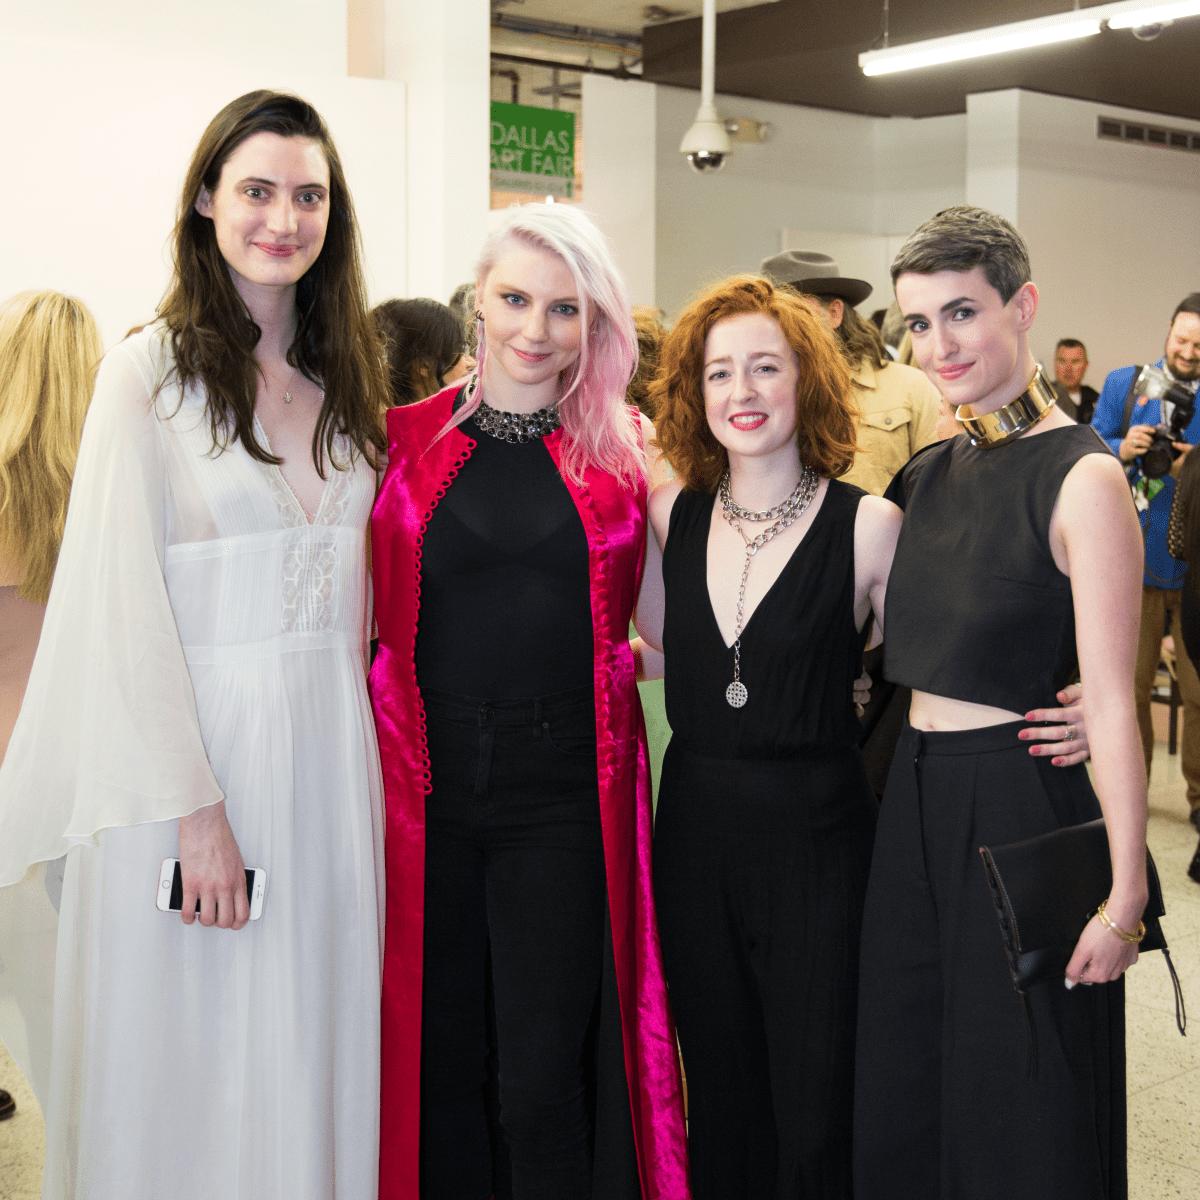 Kay Herriman, Trinity Wilson, Erin Pinover, Justine Ludwig